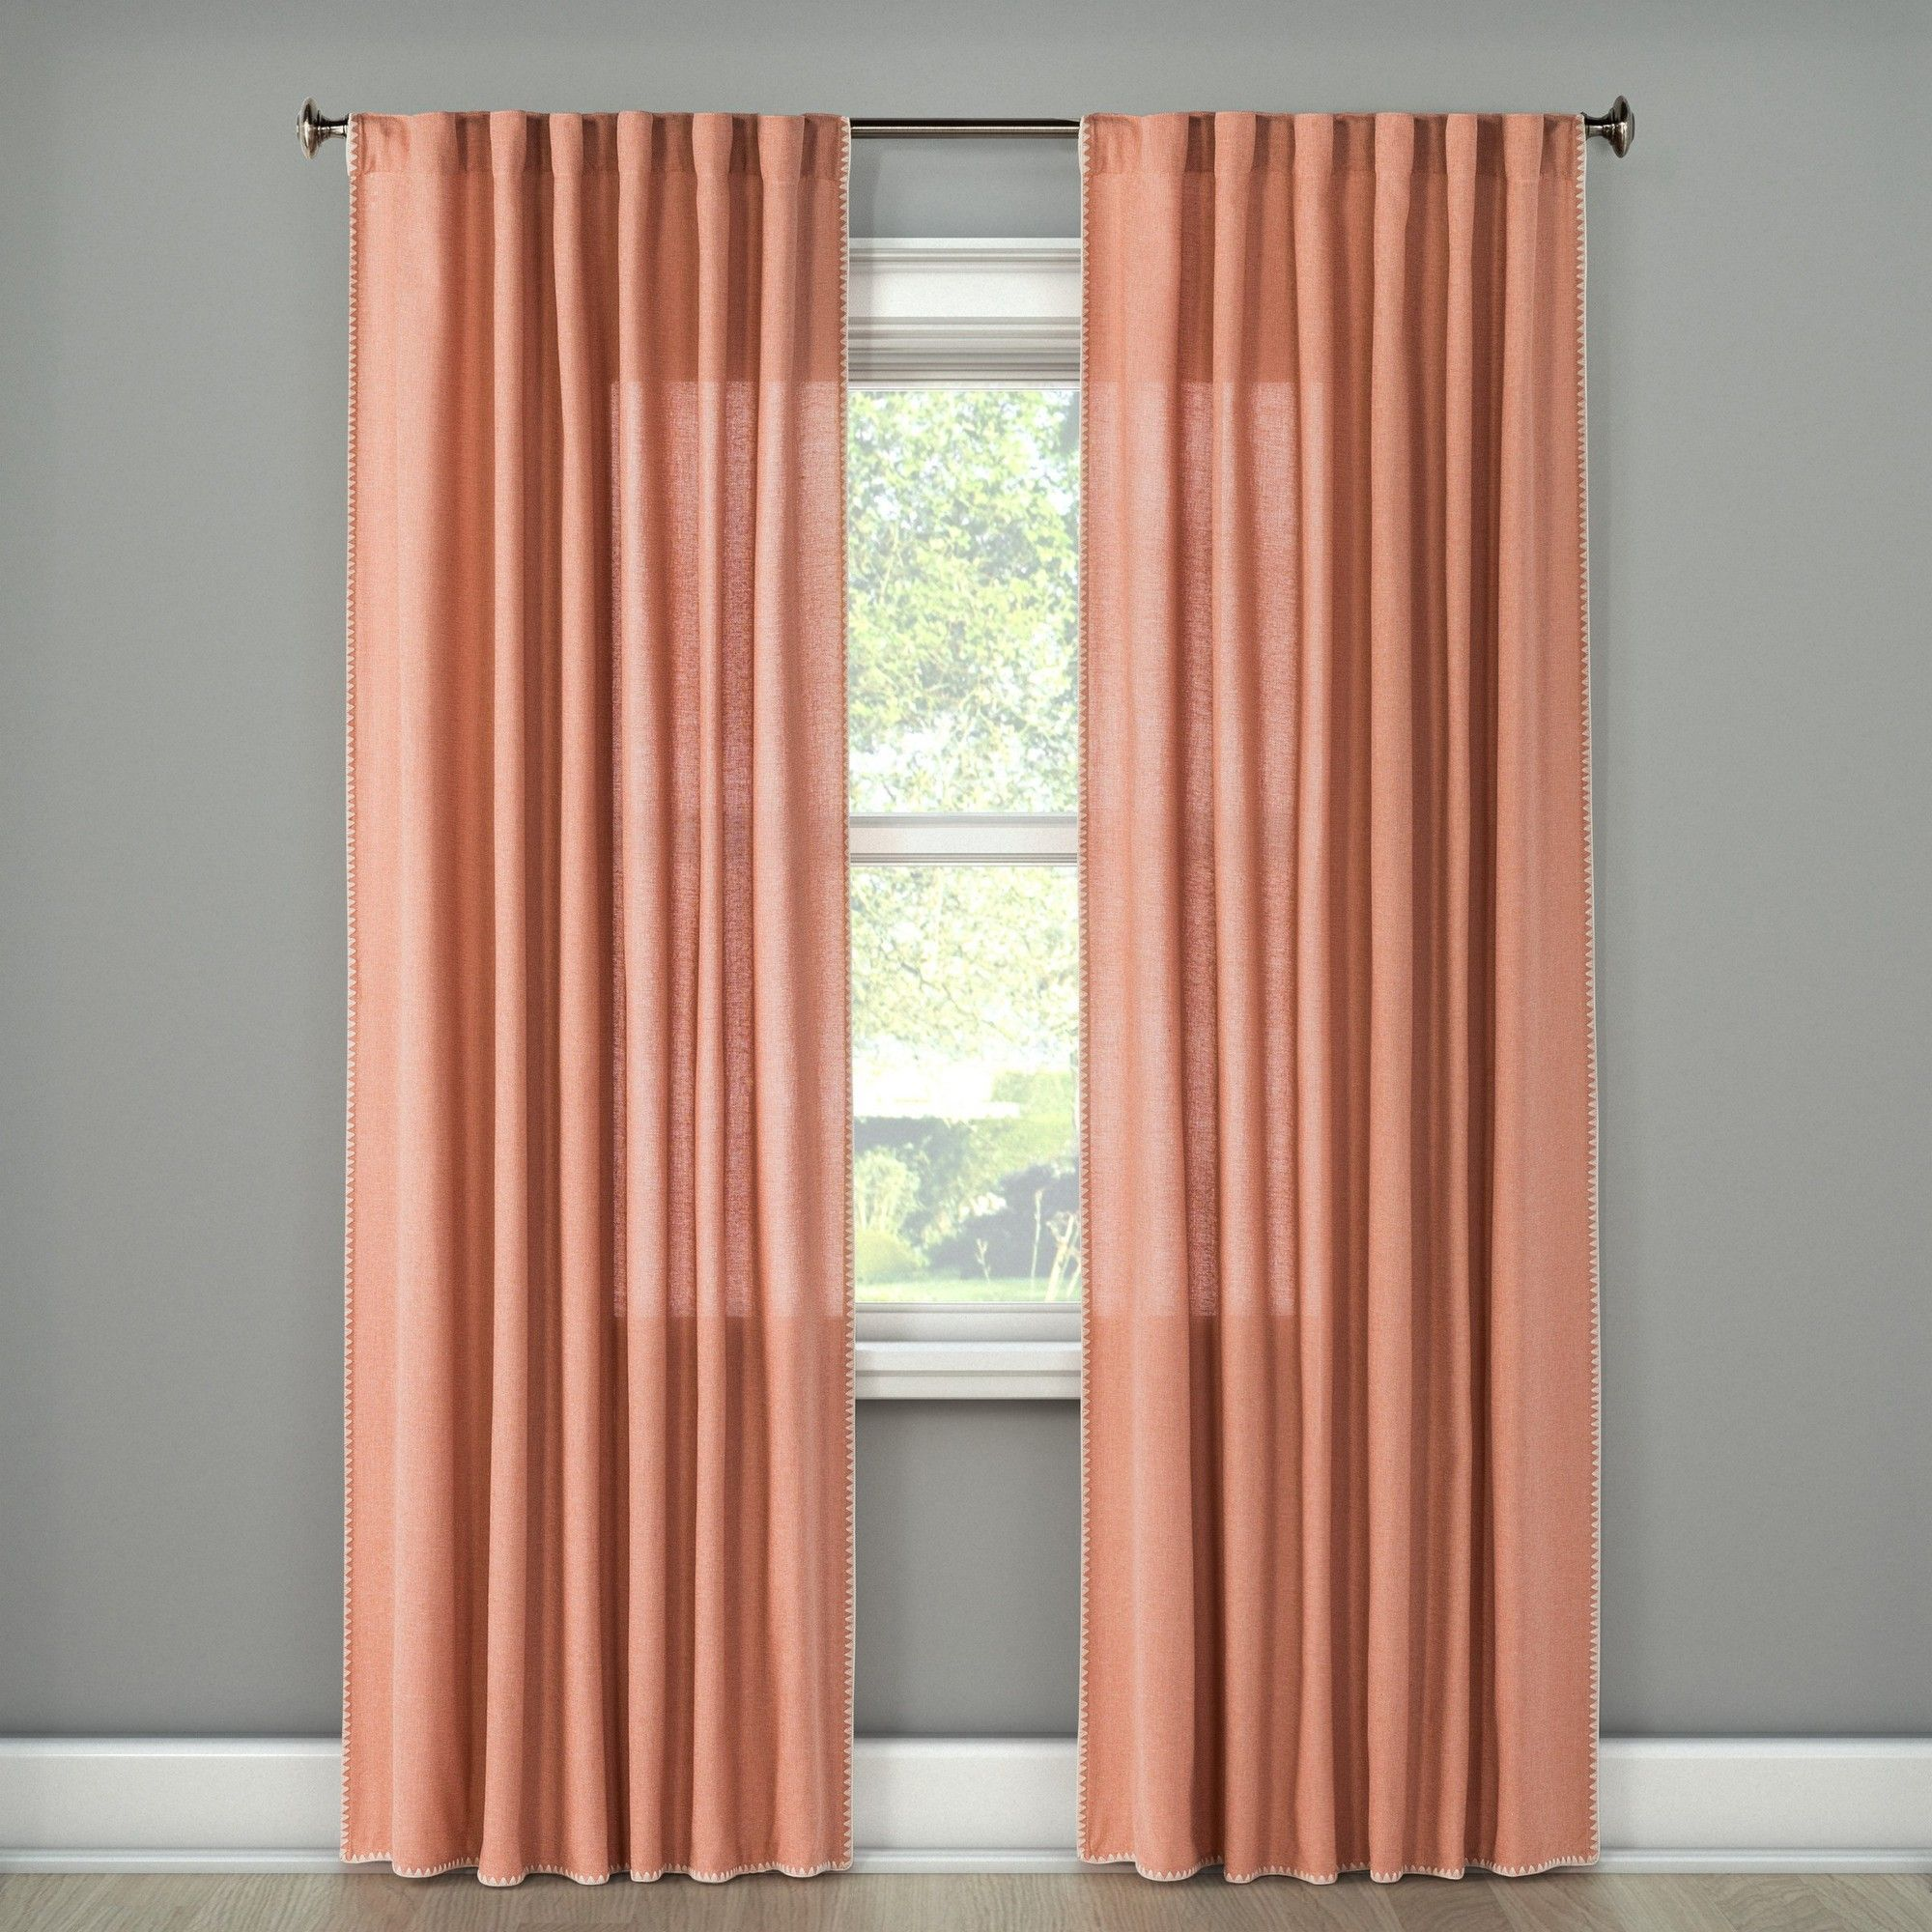 54 X84 Stitched Edge Curtain Panel Peach Threshold Living Room Decor Curtains Panel Curtains Curtains #peach #living #room #curtains